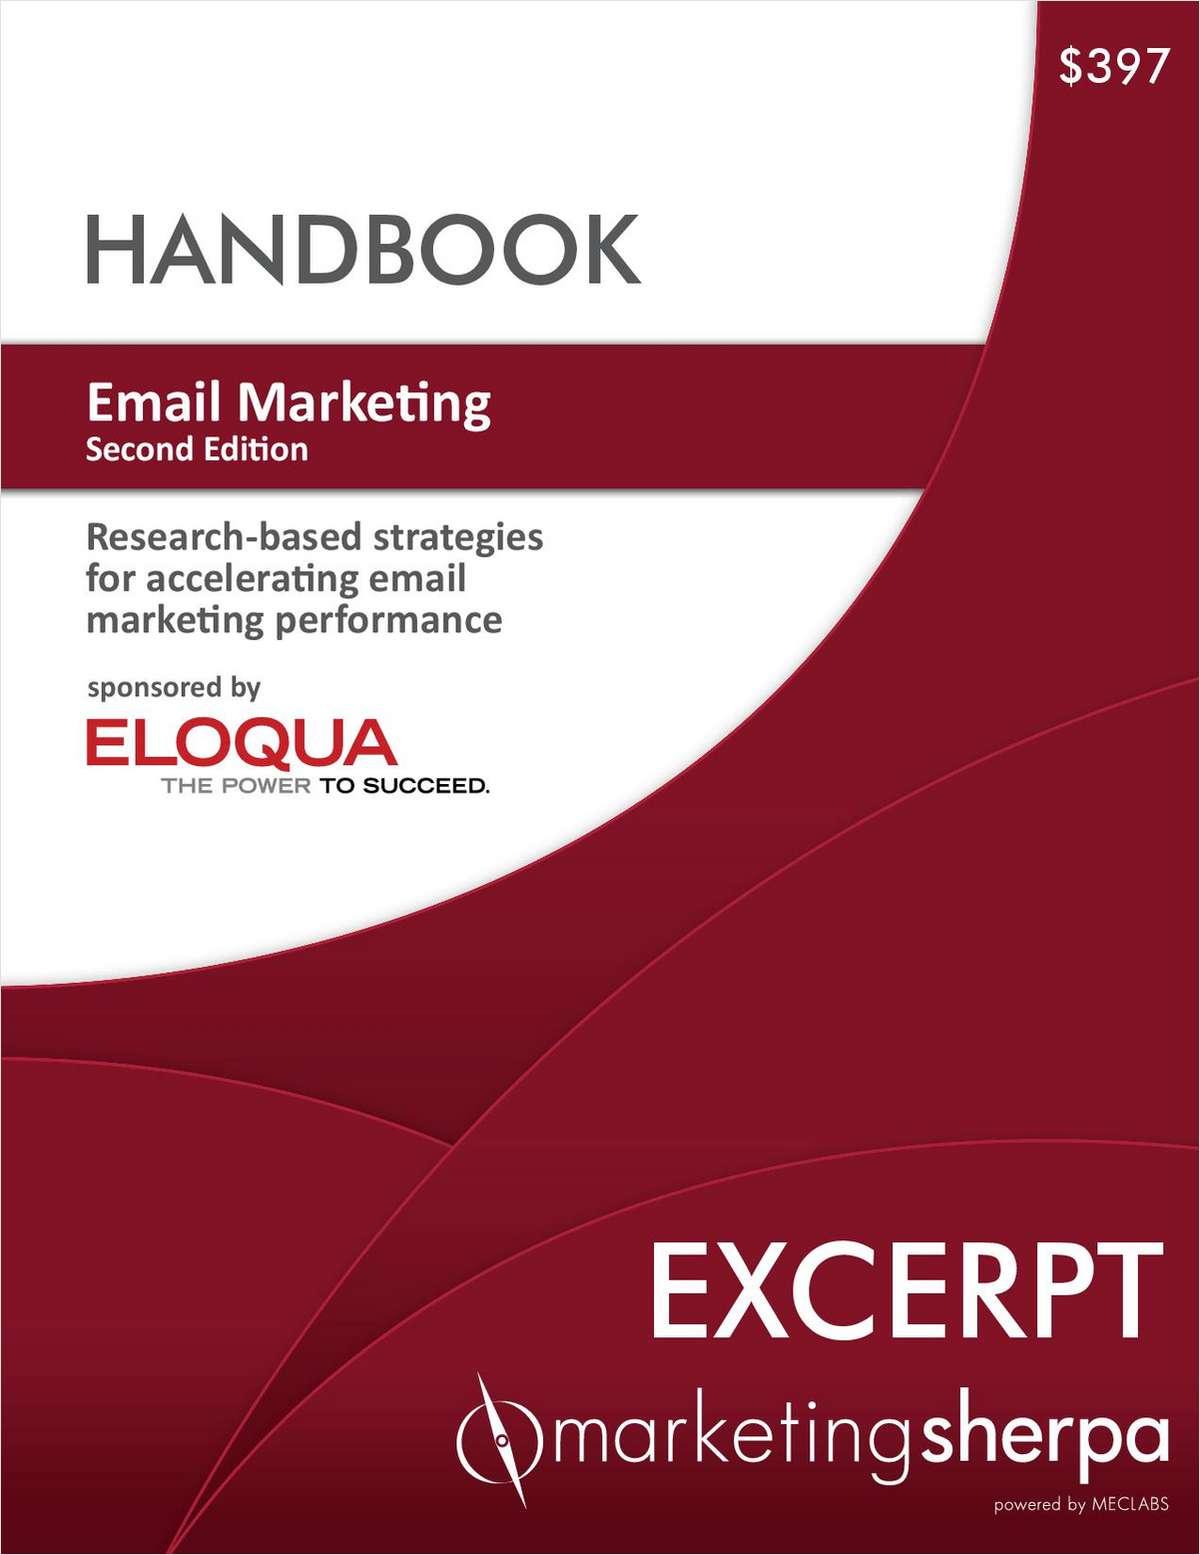 Email Marketing Handbook: Second Edition--Free Excerpt